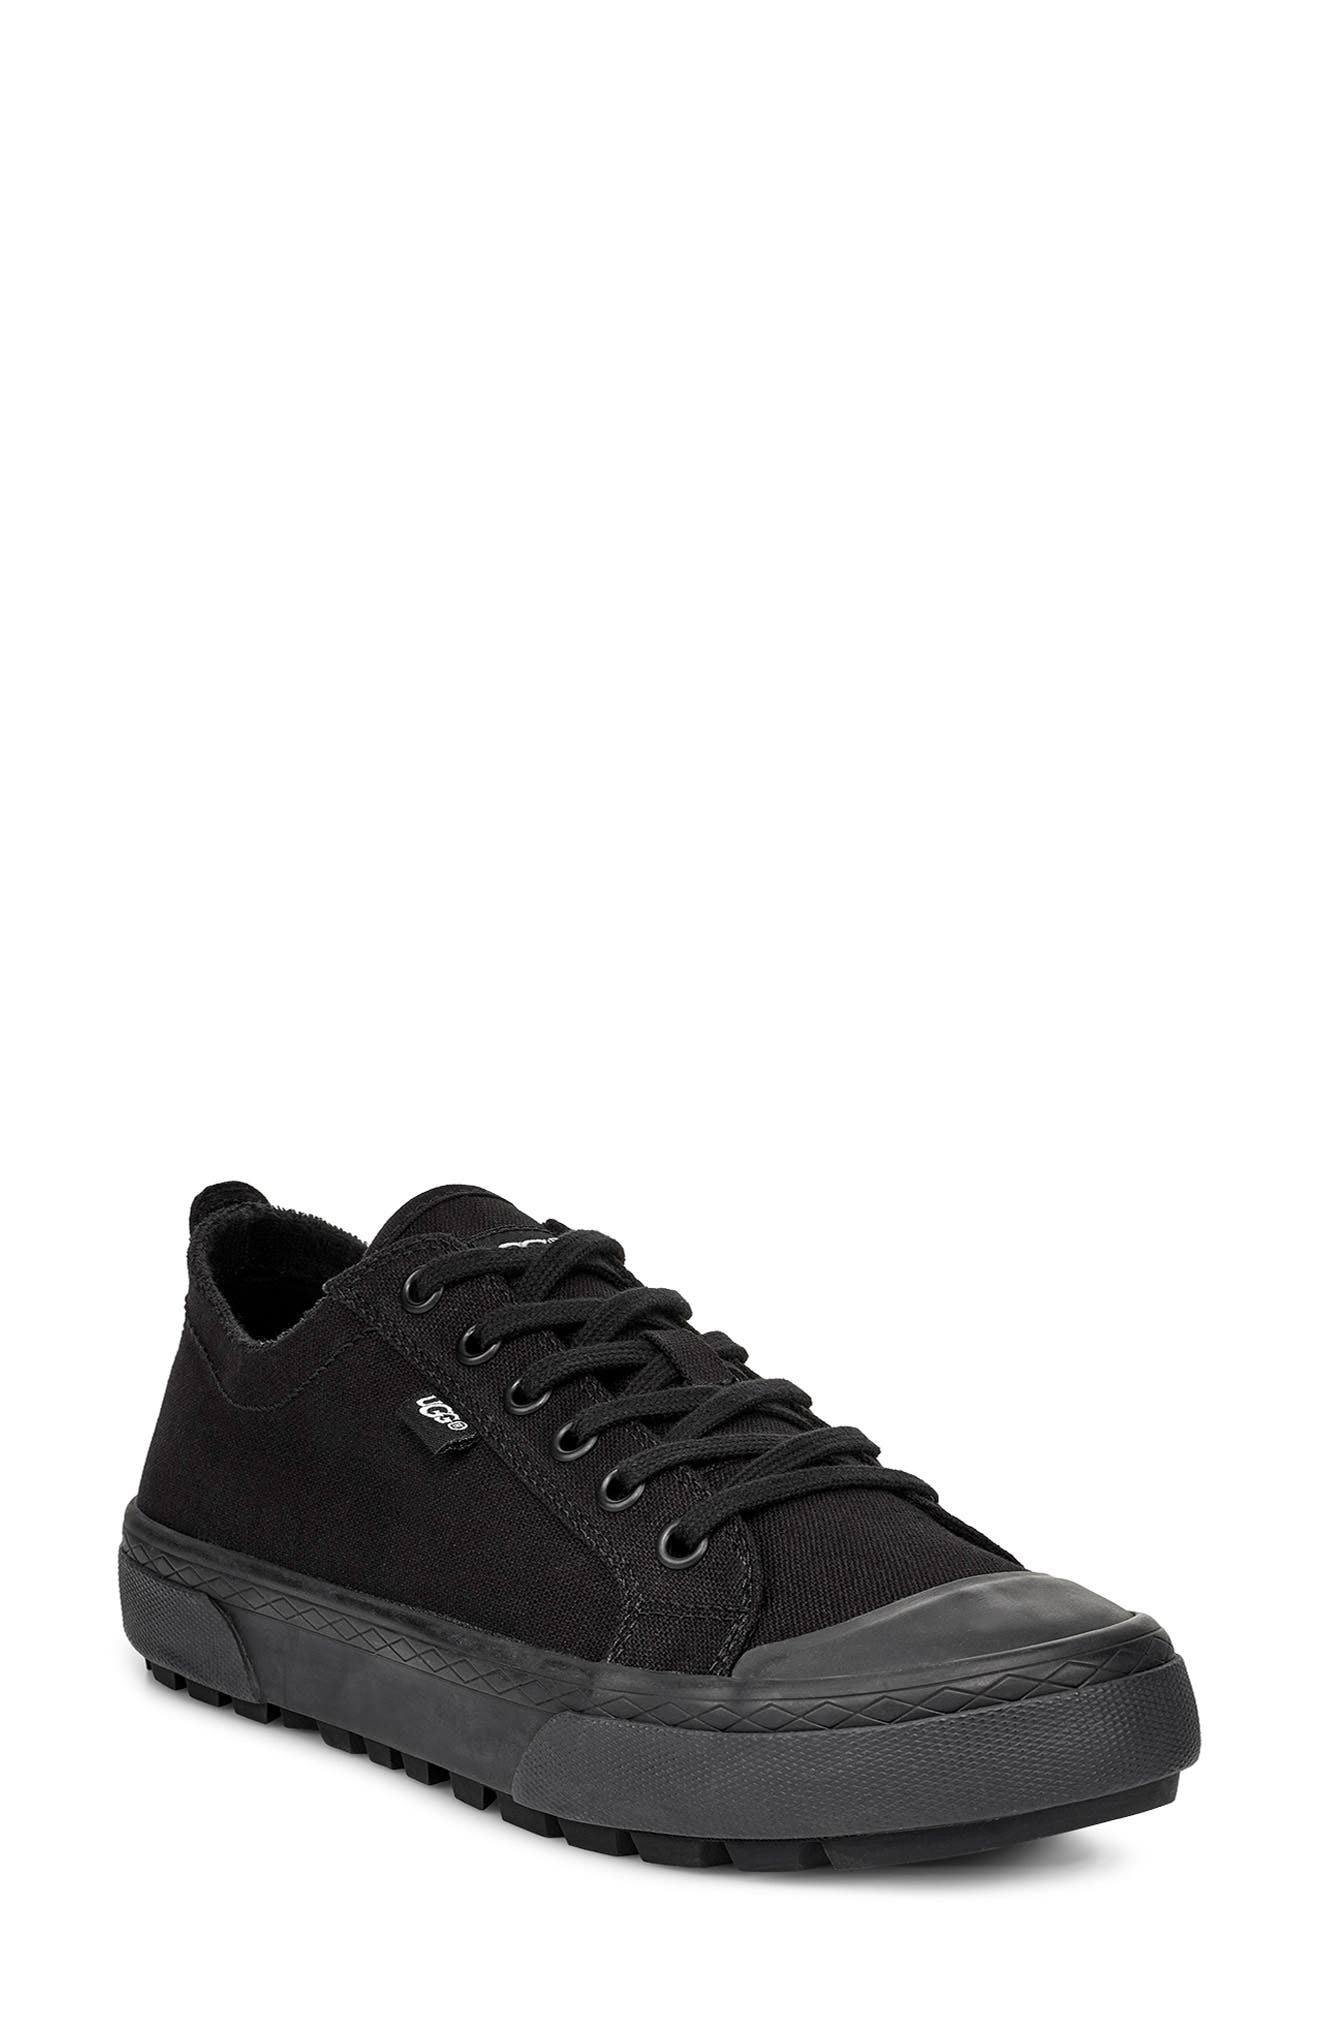 Ugg Aries Platform Sneaker- Black